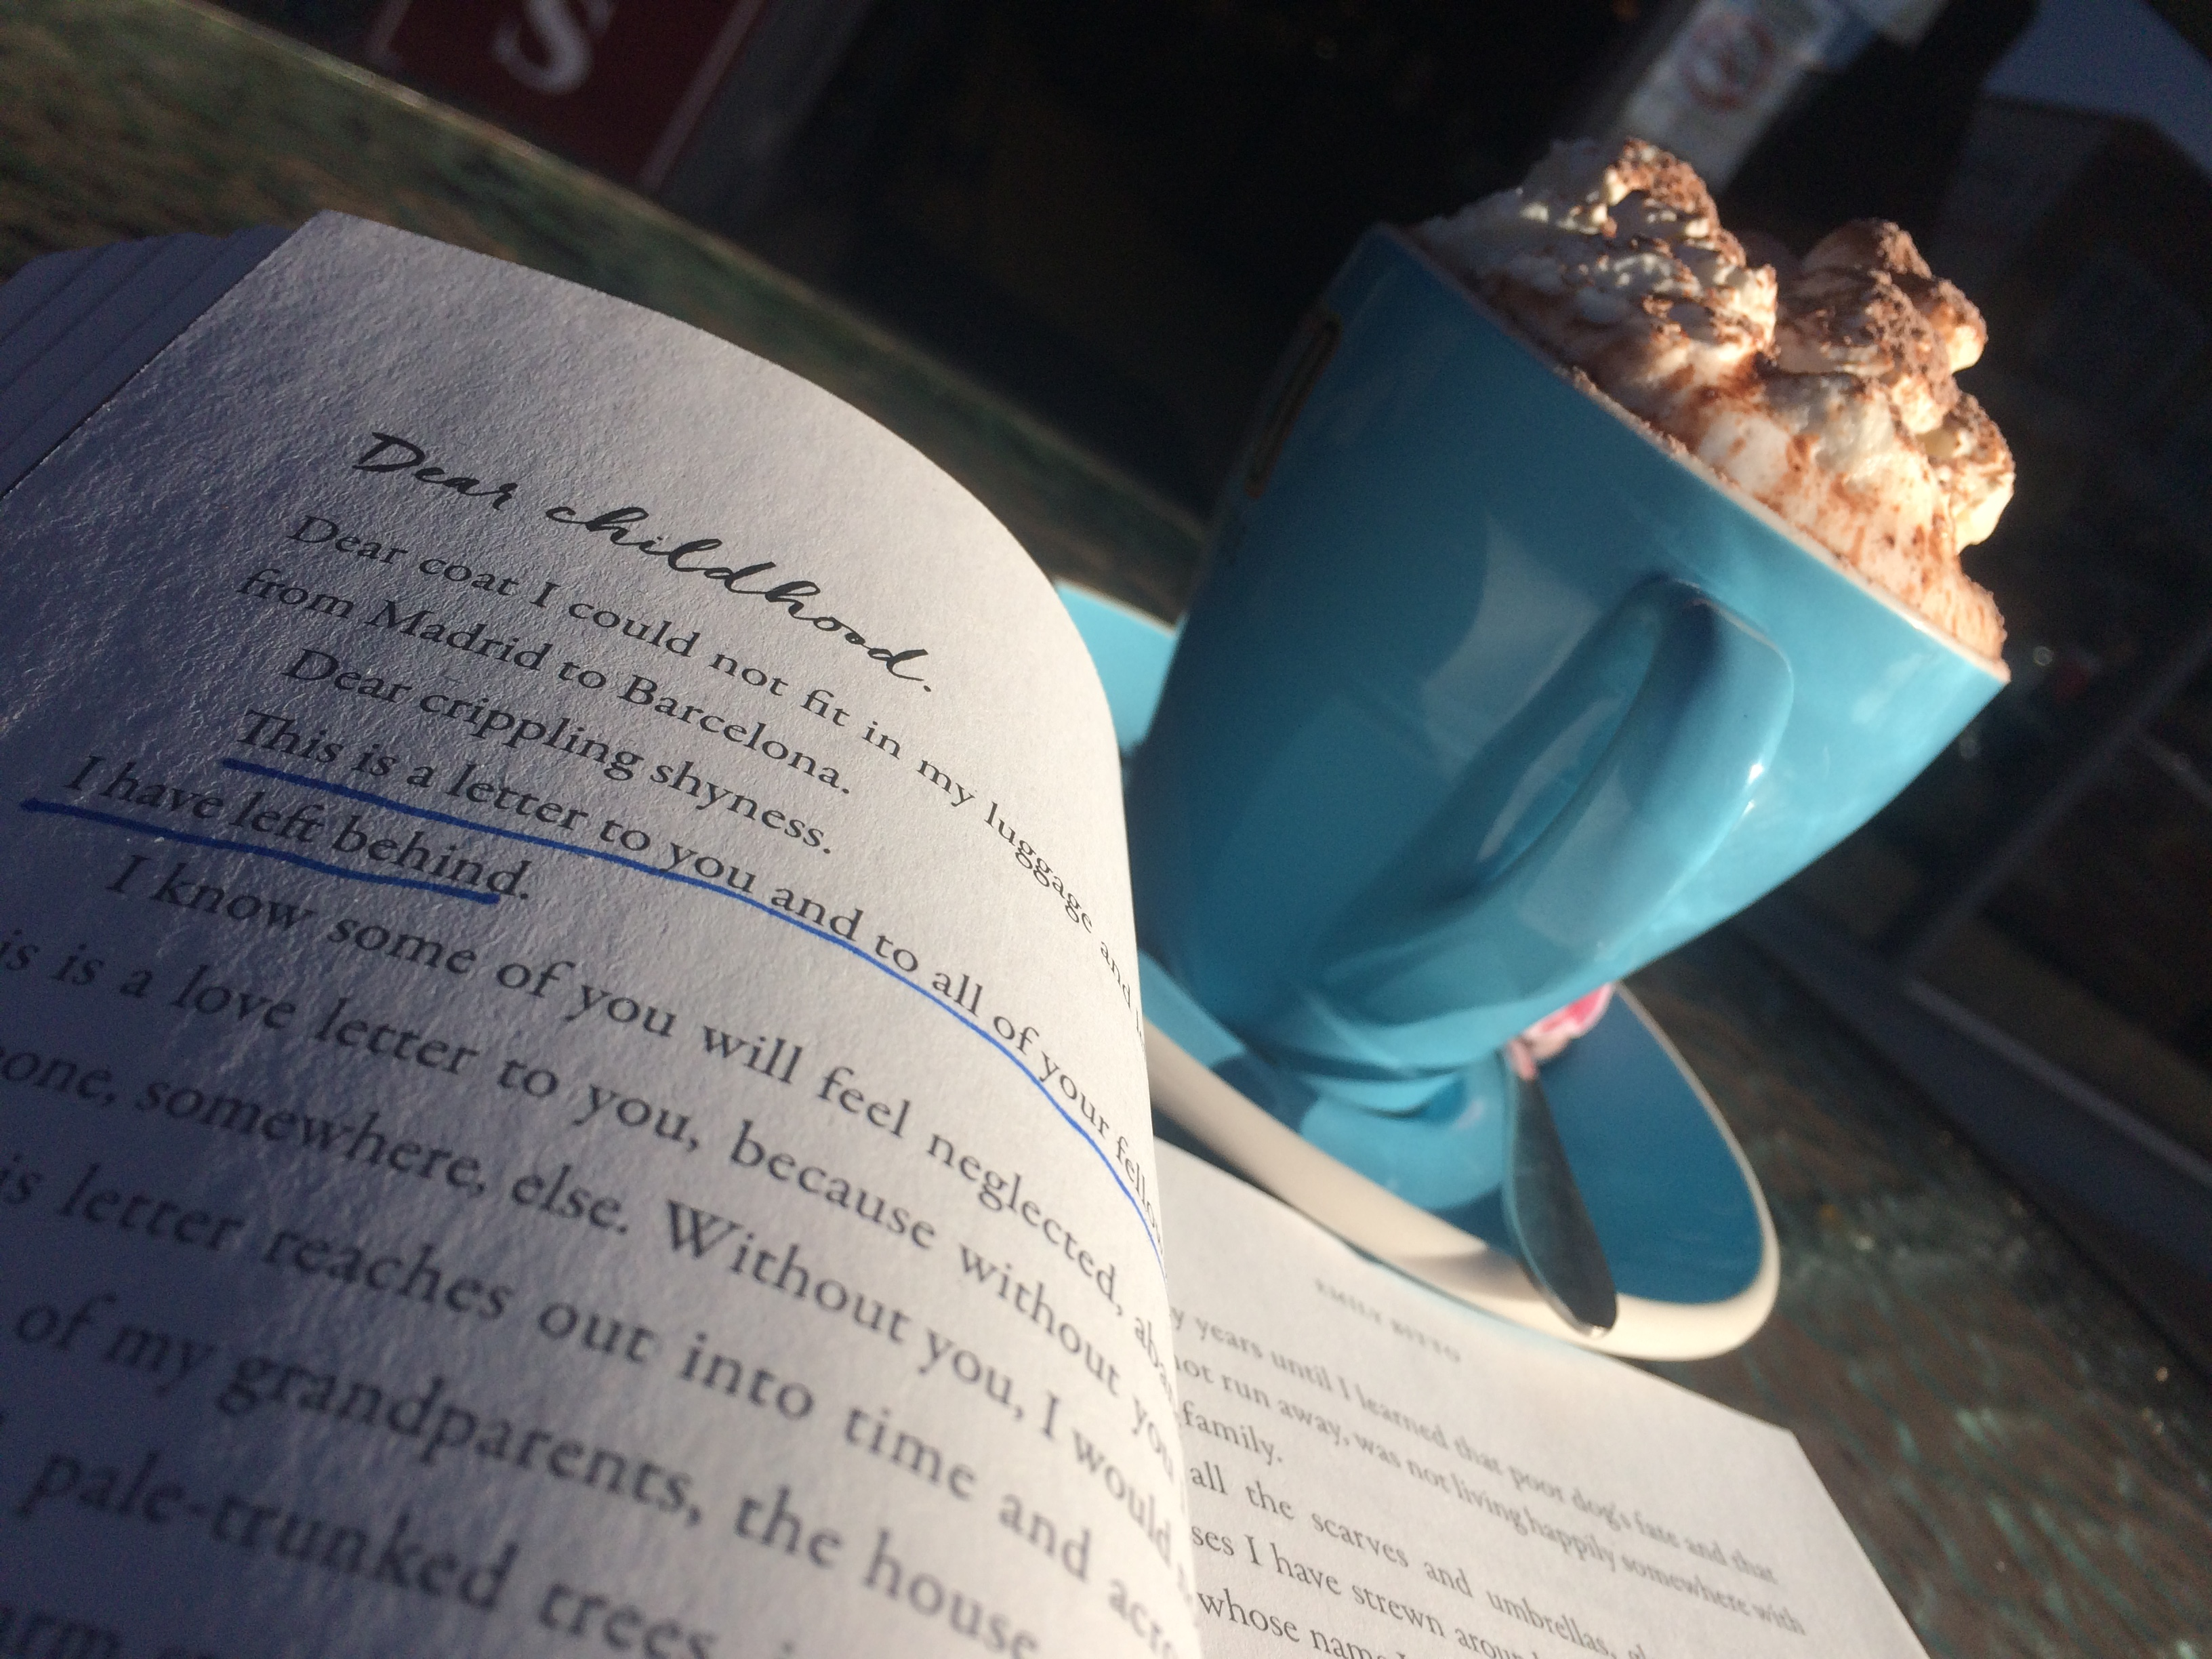 Hot chocolate & book